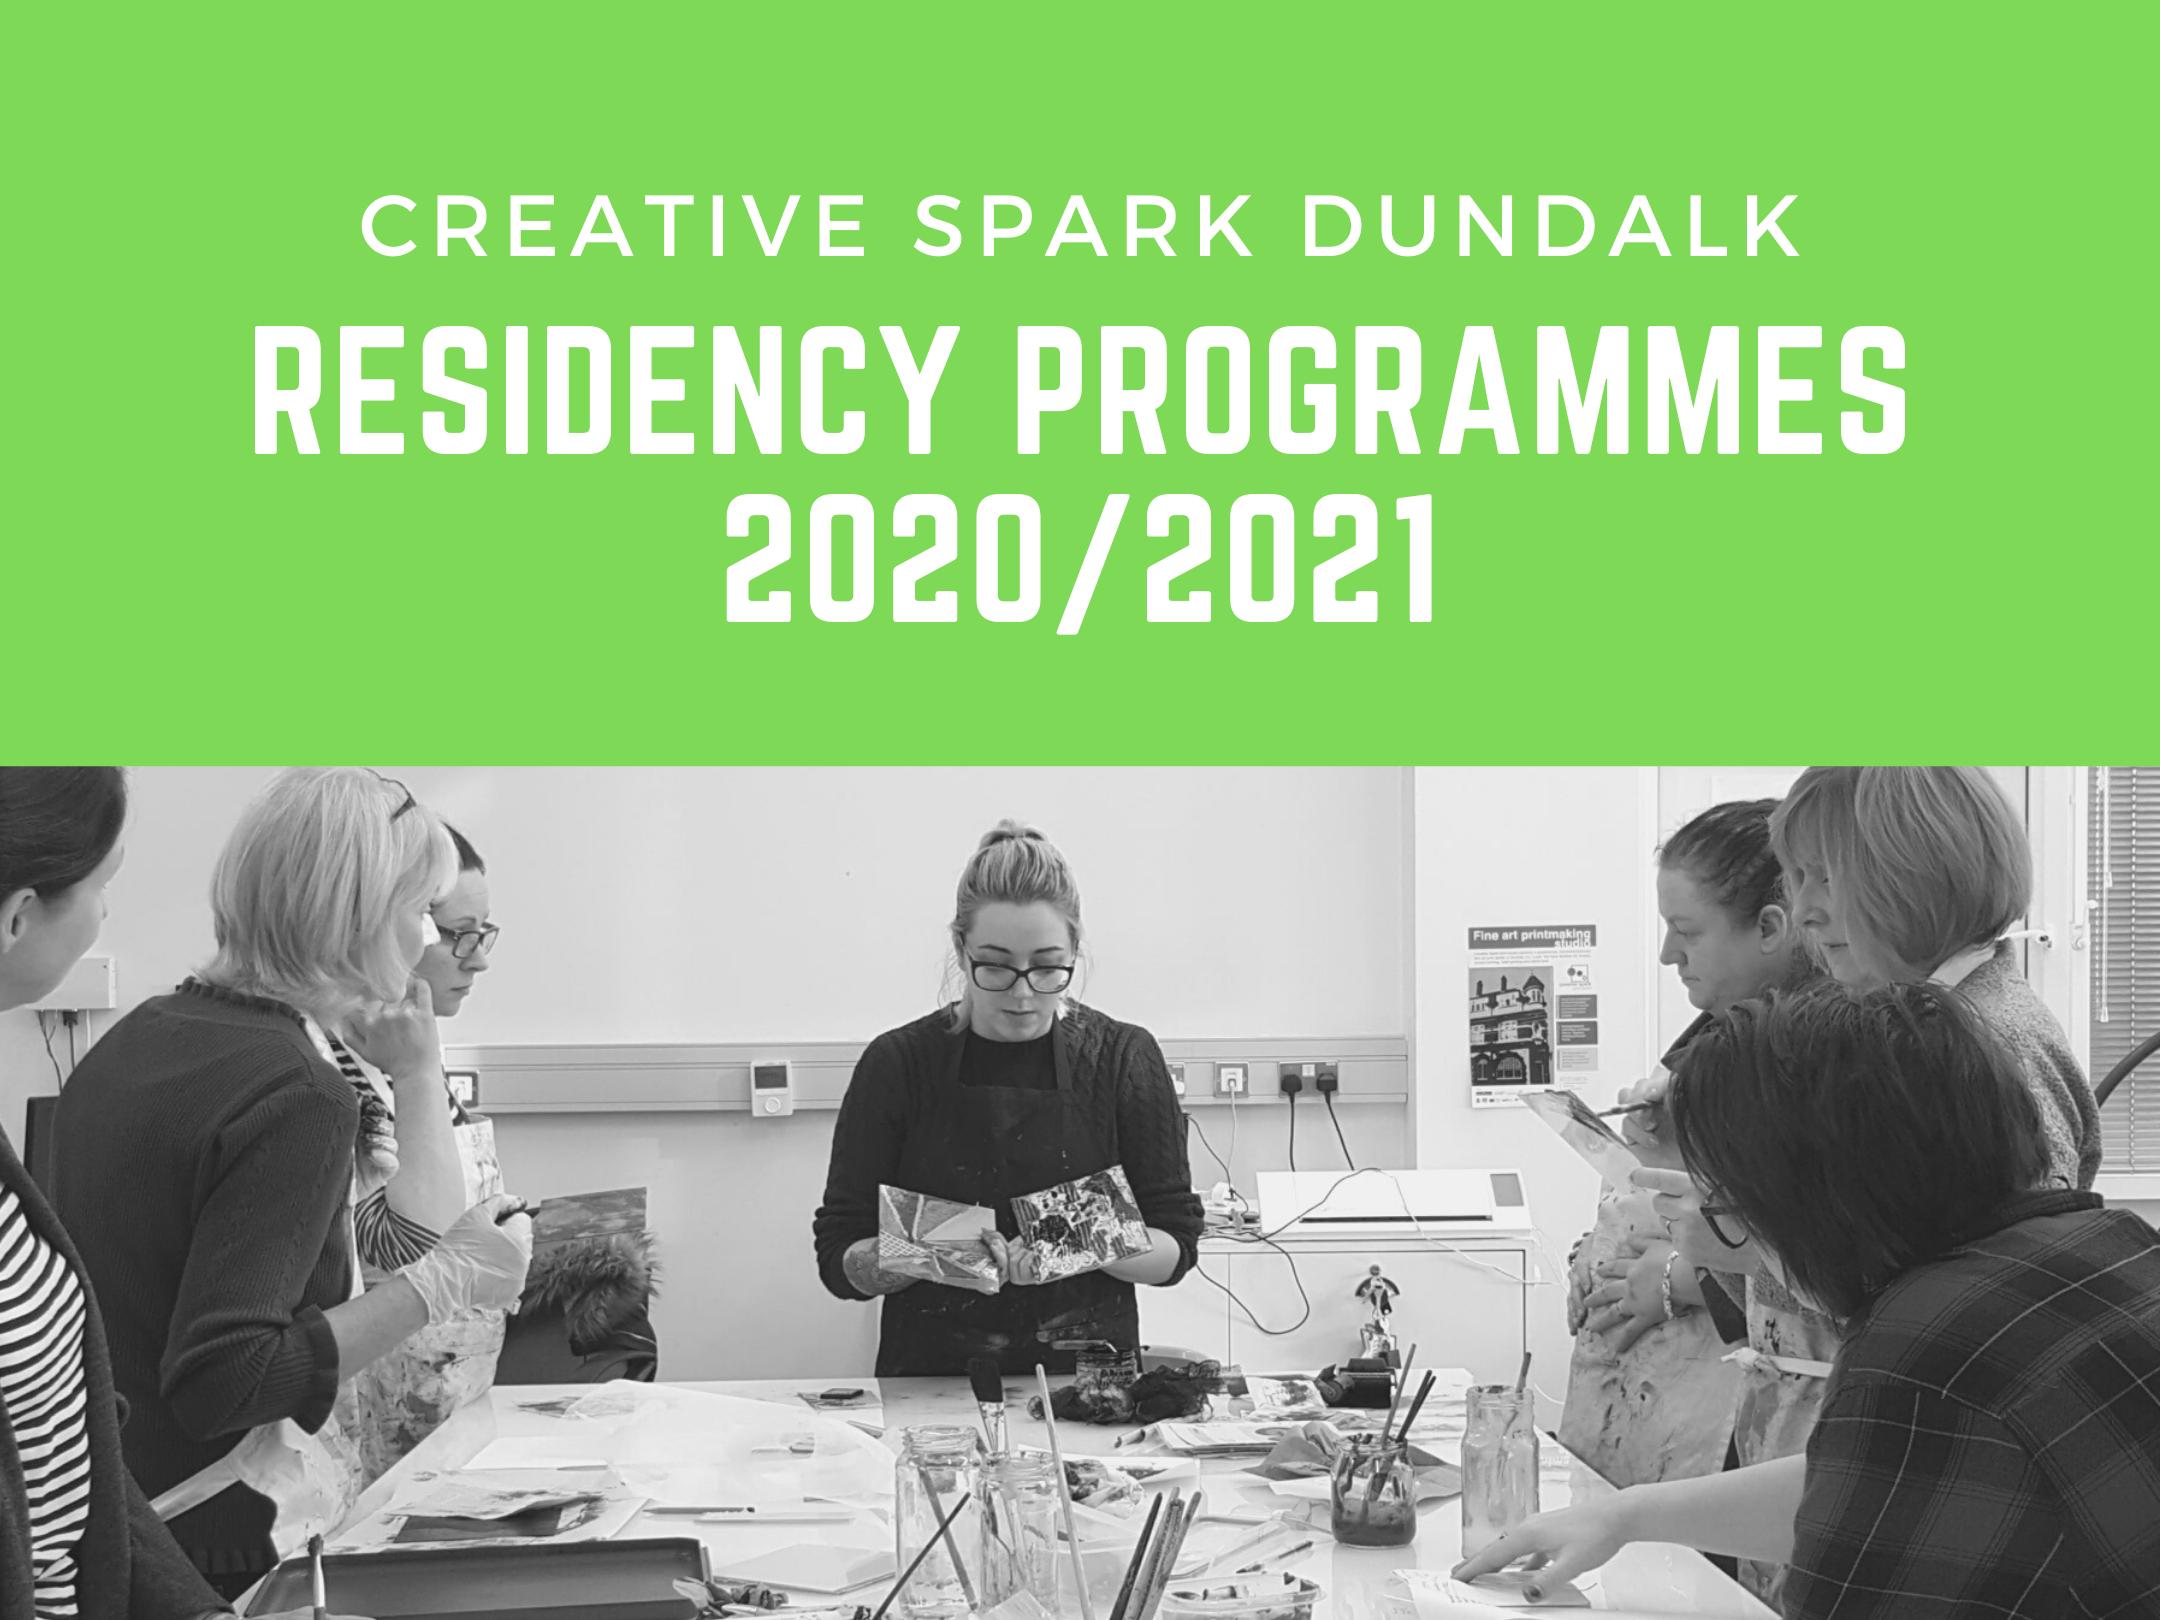 Residency Programme 2020/2021